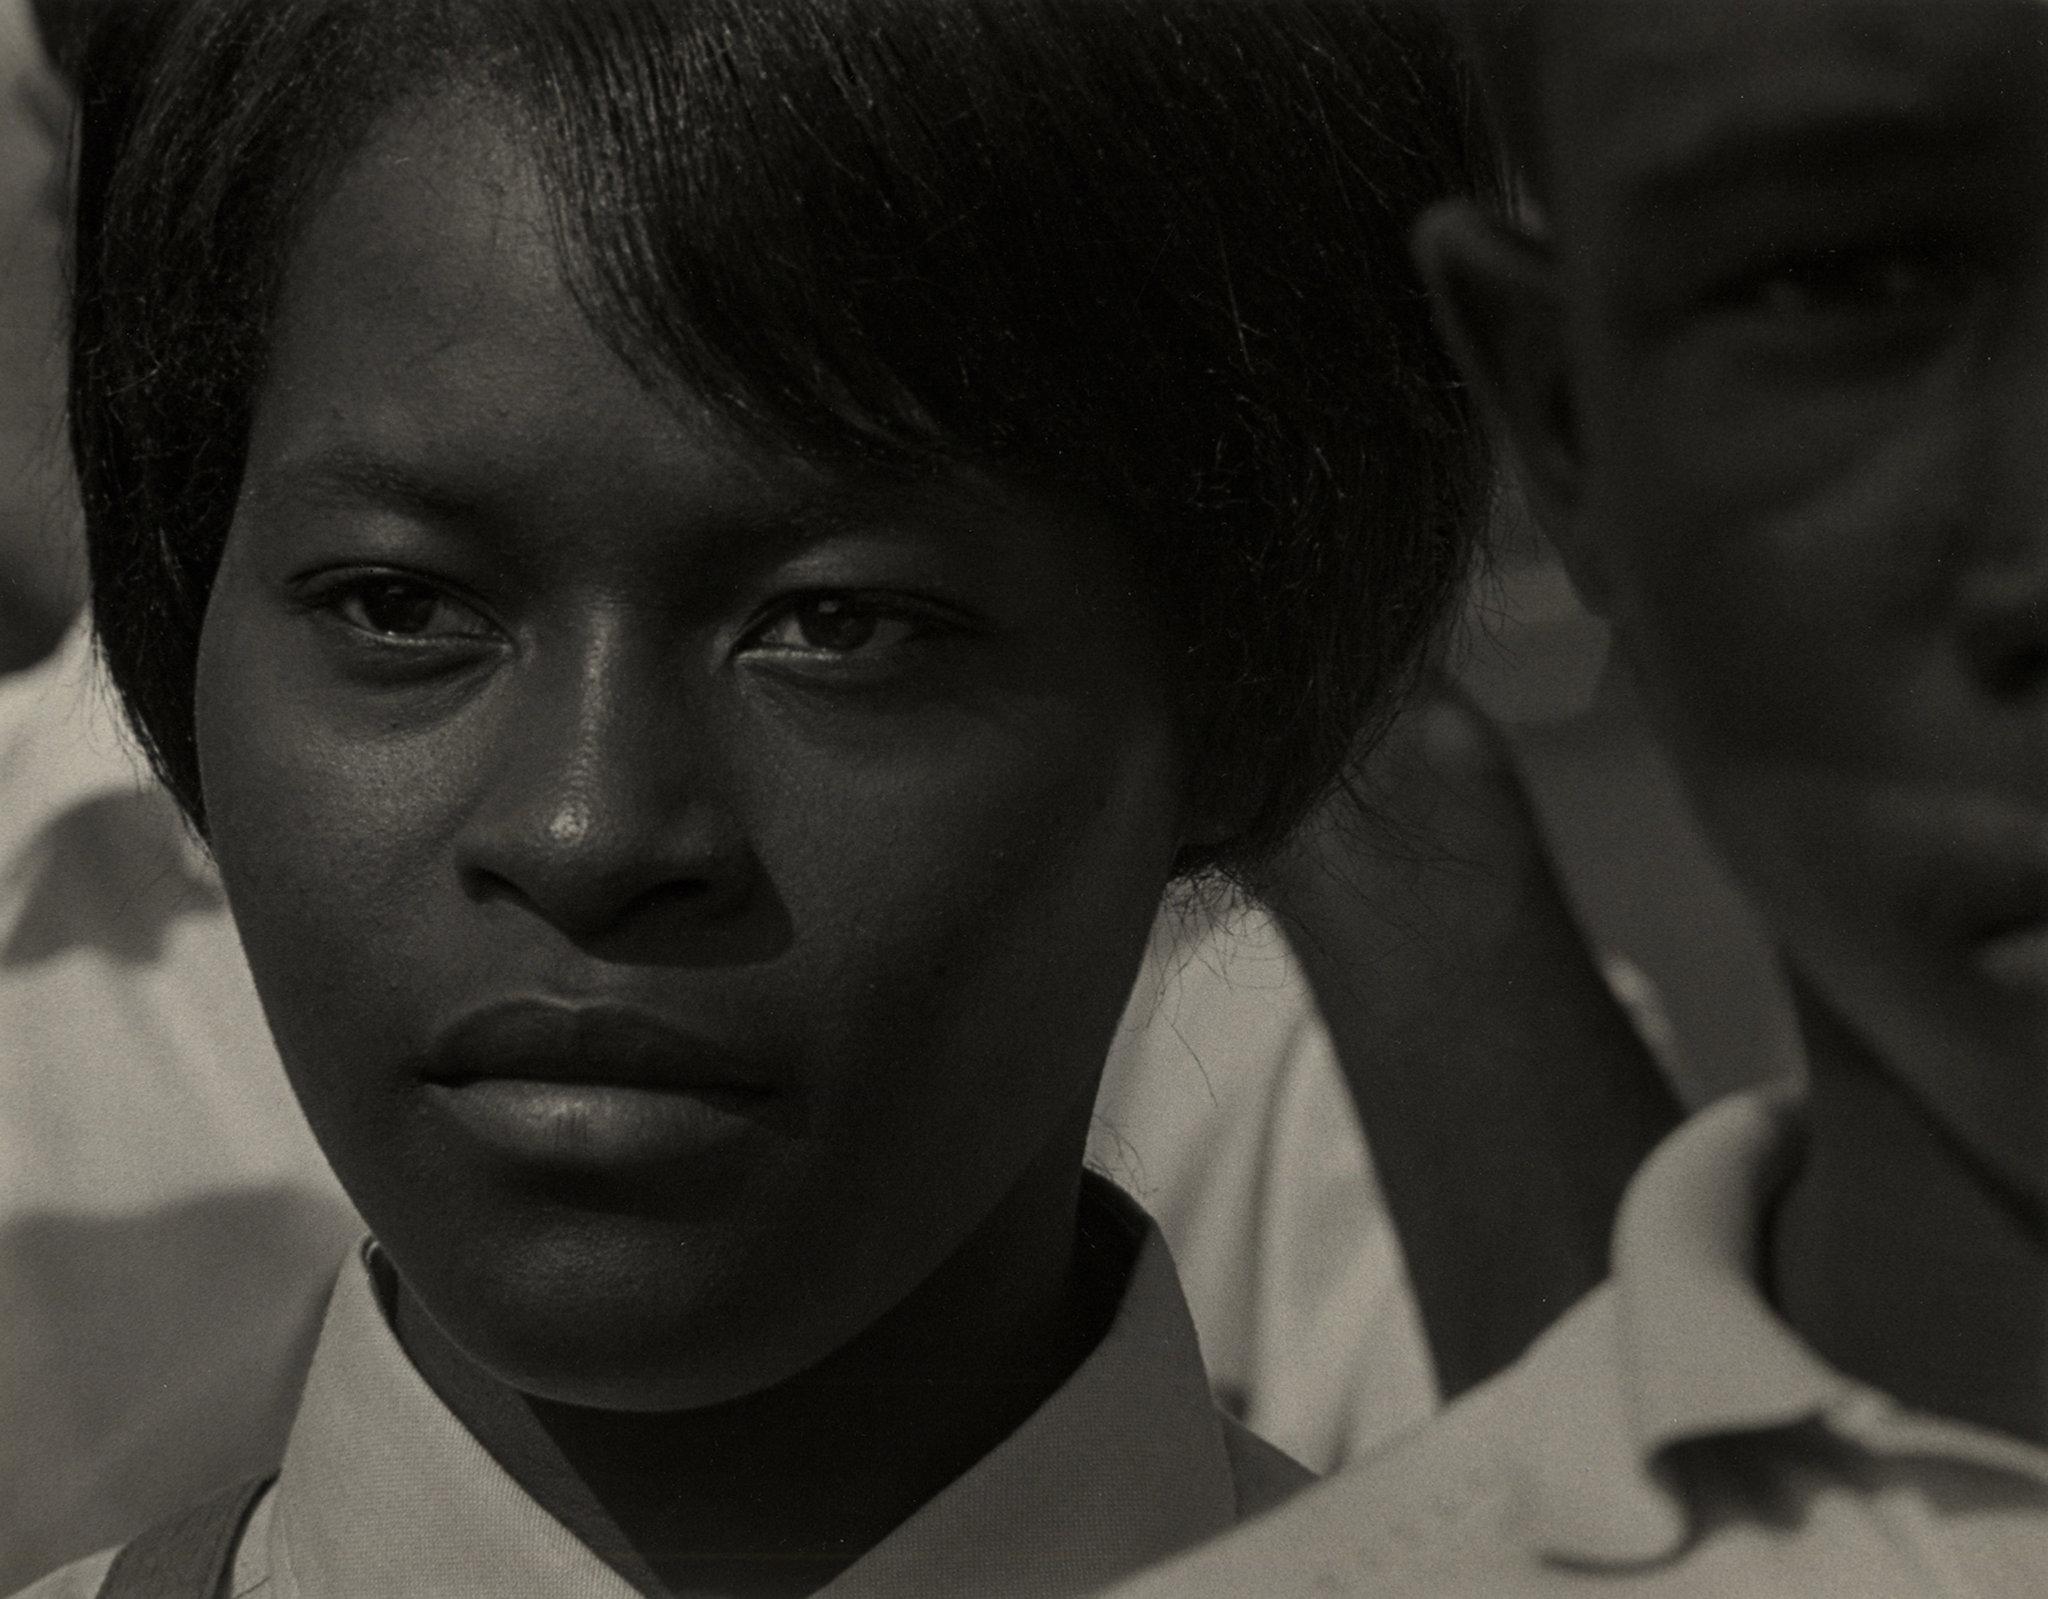 Roy DeCarava, Mississippi Freedom Marcher, Washington, D.C., 1963, Copyright: Sherry Turner DeCarava/RSD Foundation